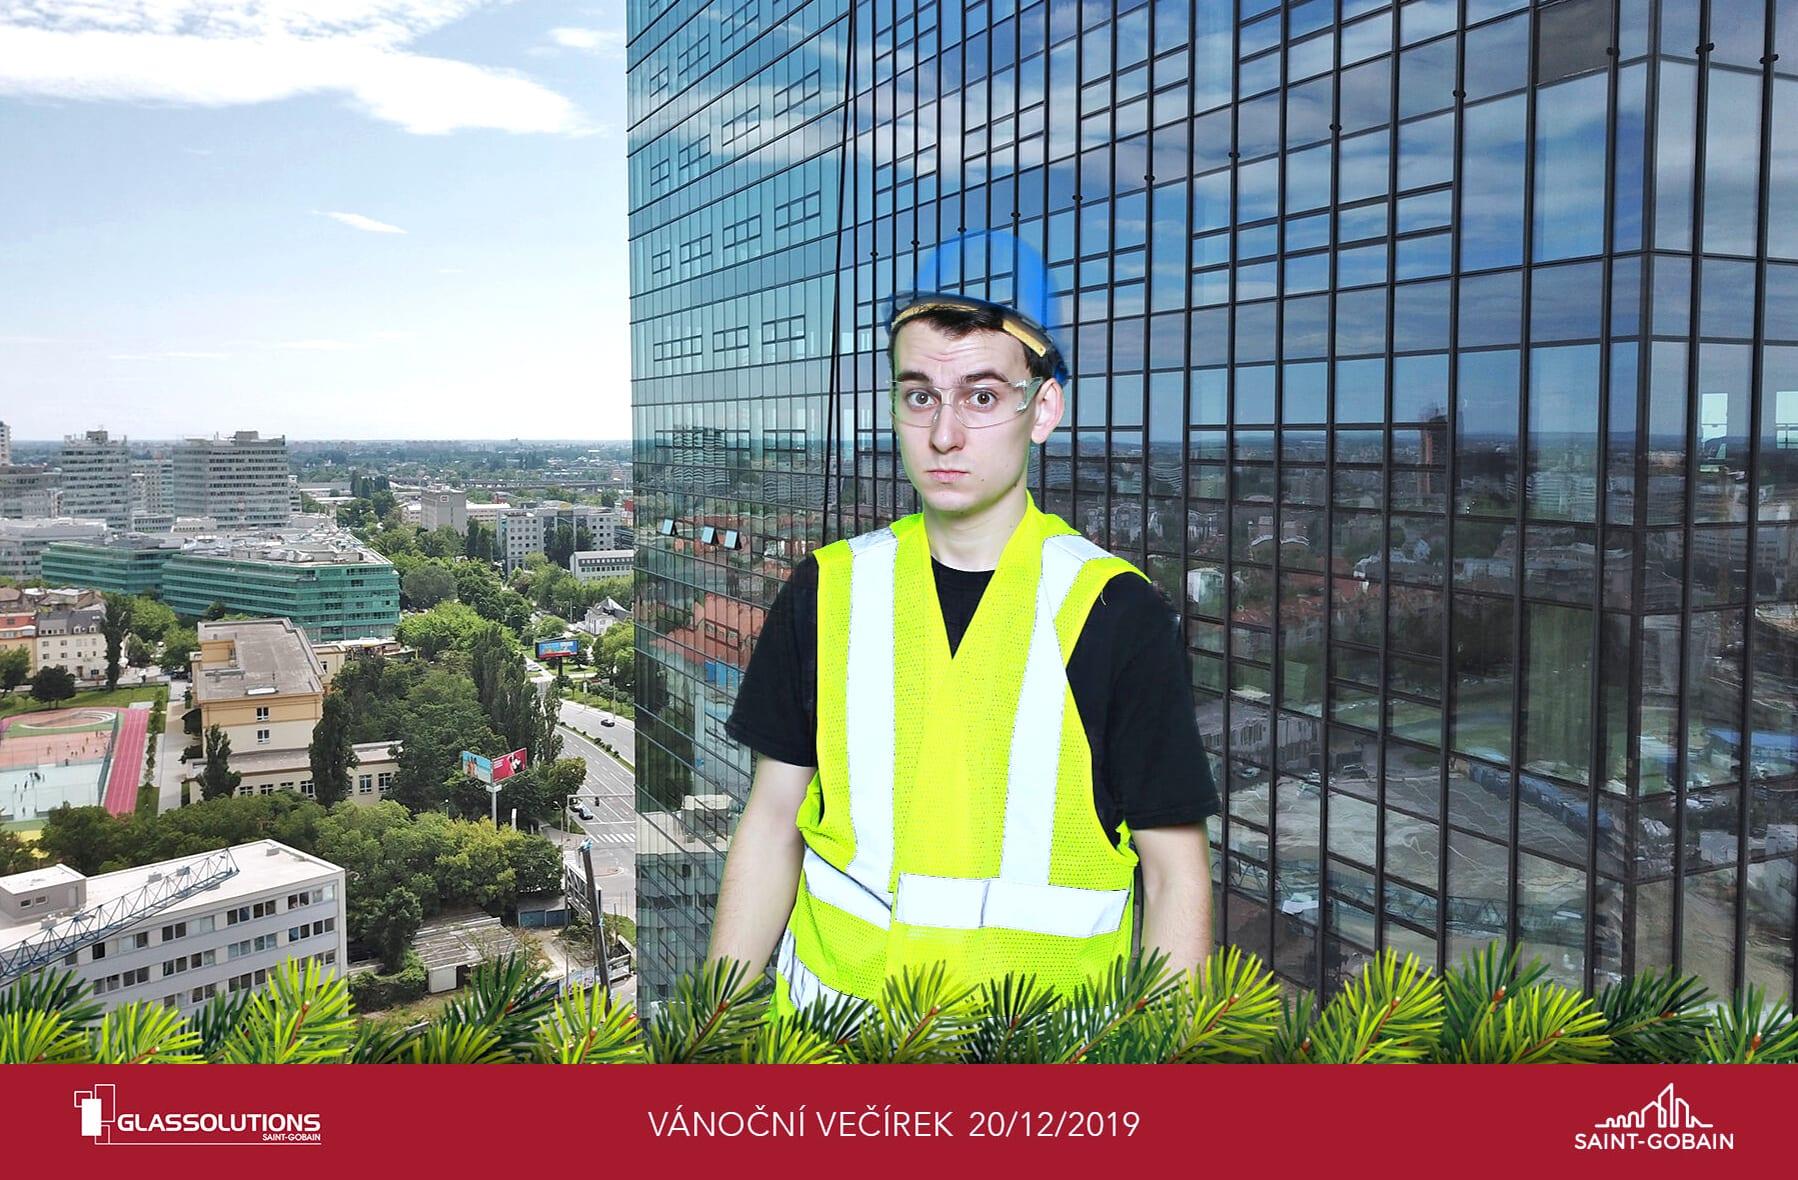 fotokoutek-brno-firemni-vecirek-vanocni-vecirek-glassolutions-20-12-2019-704069